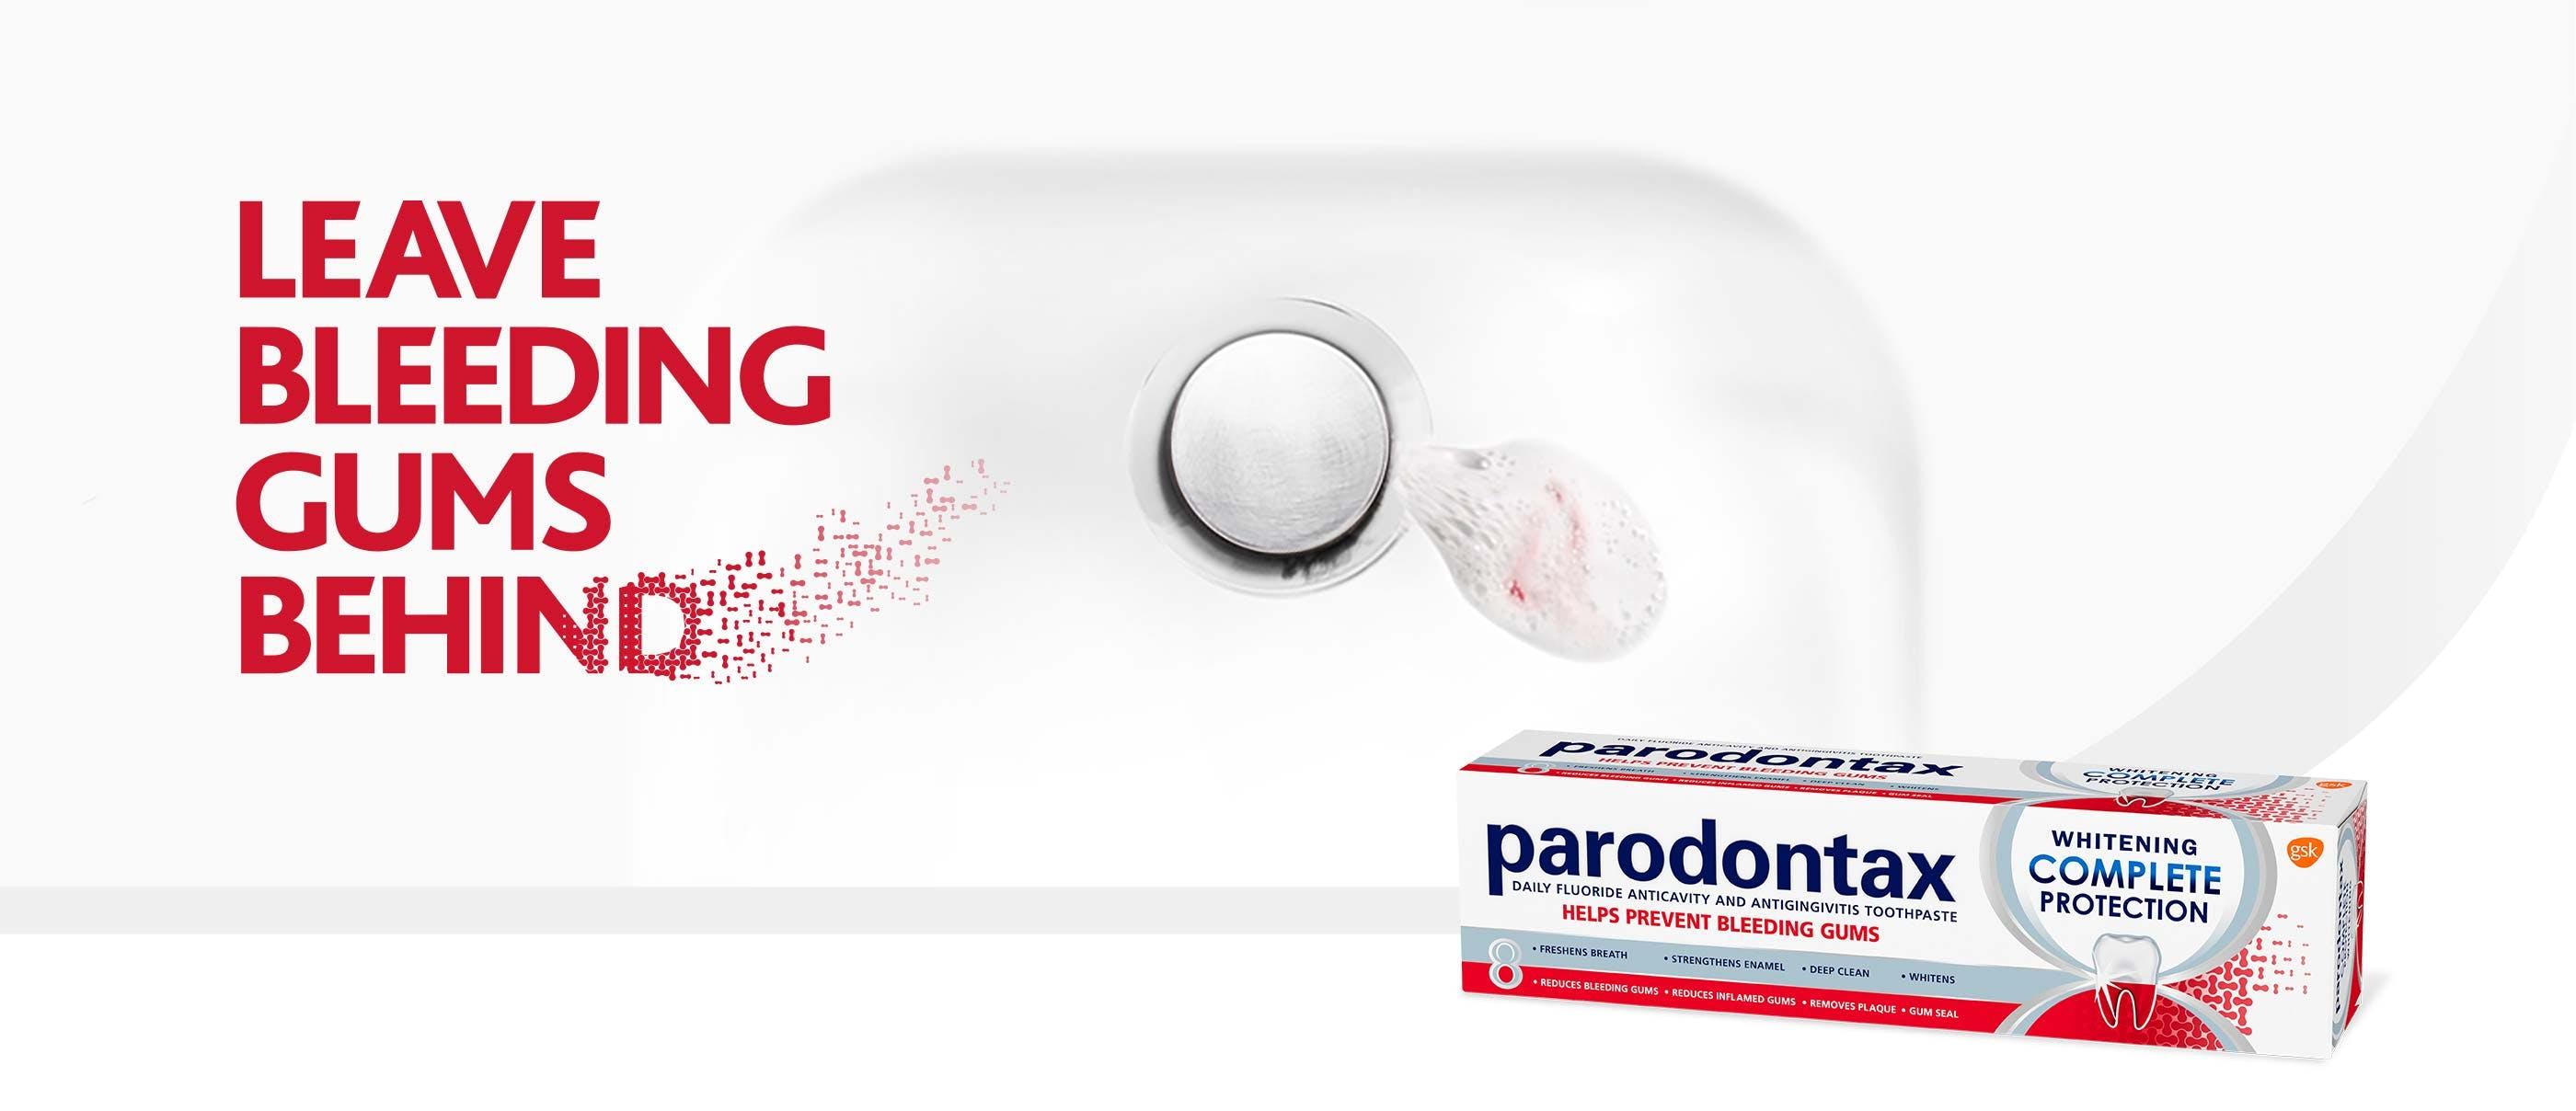 Leave bleeding gums behind with parodontax